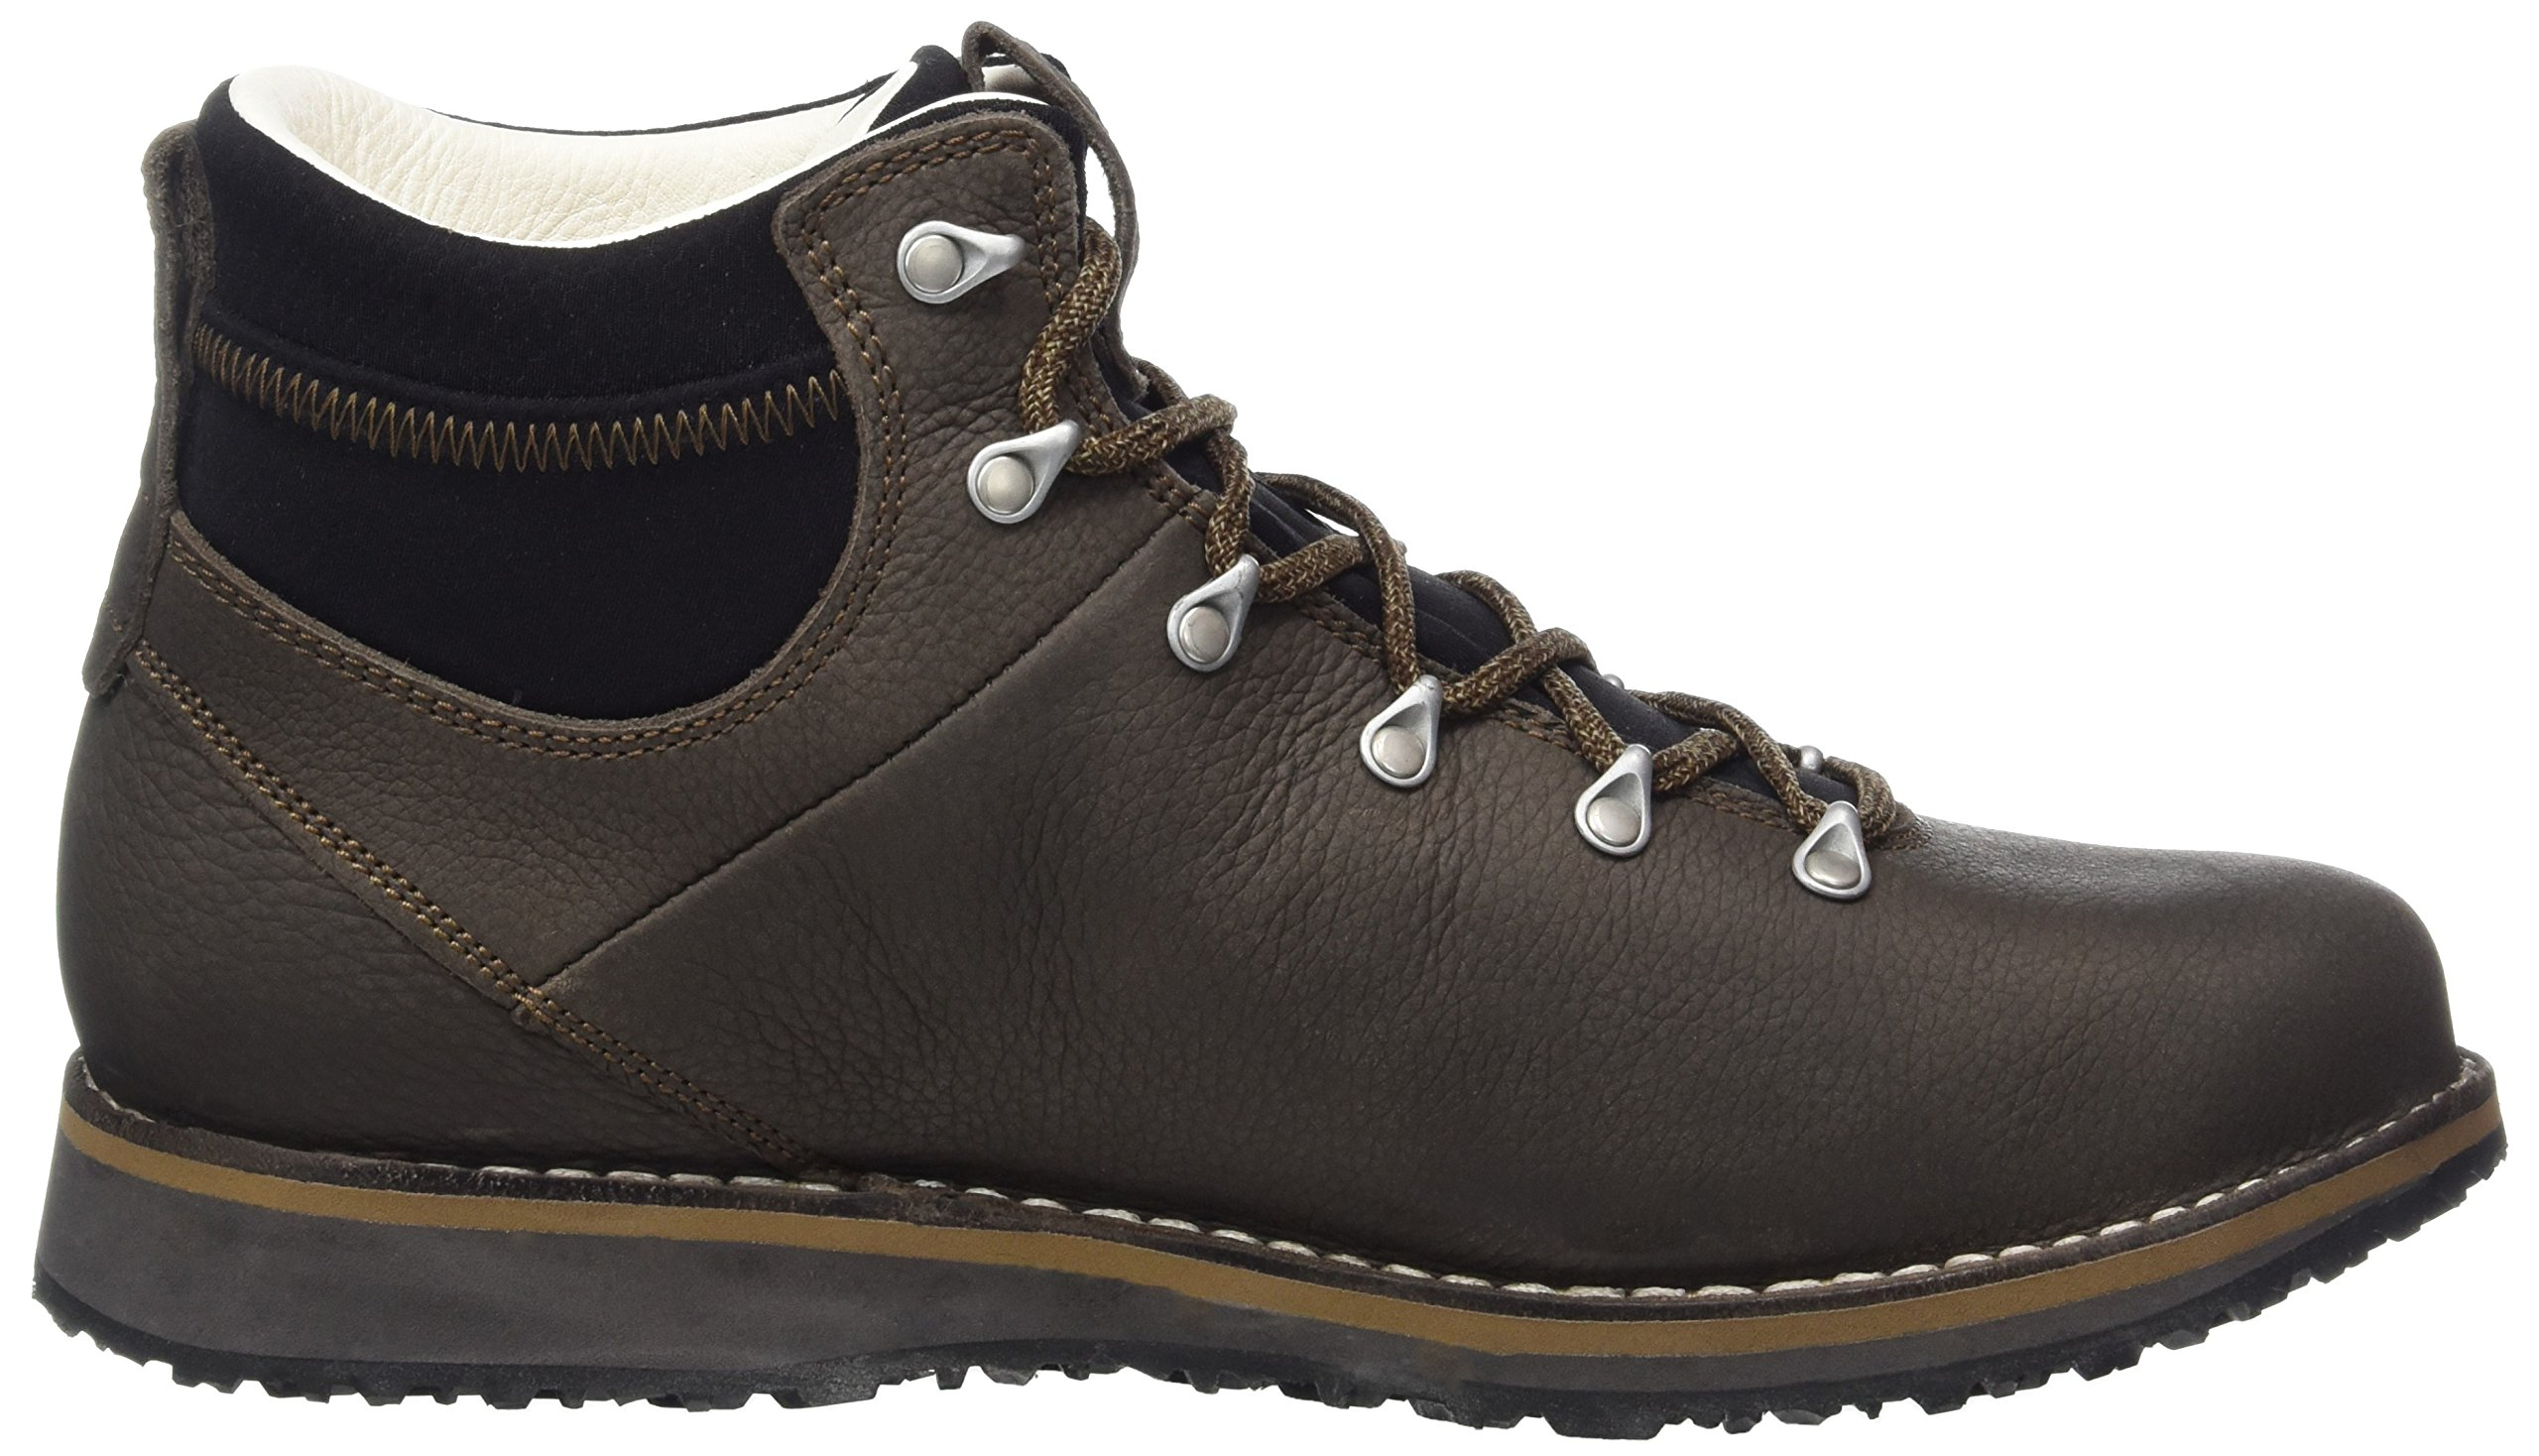 81IiLBfkYqL - AKU Unisex Adults' Badia Plus High Rise Hiking Boots